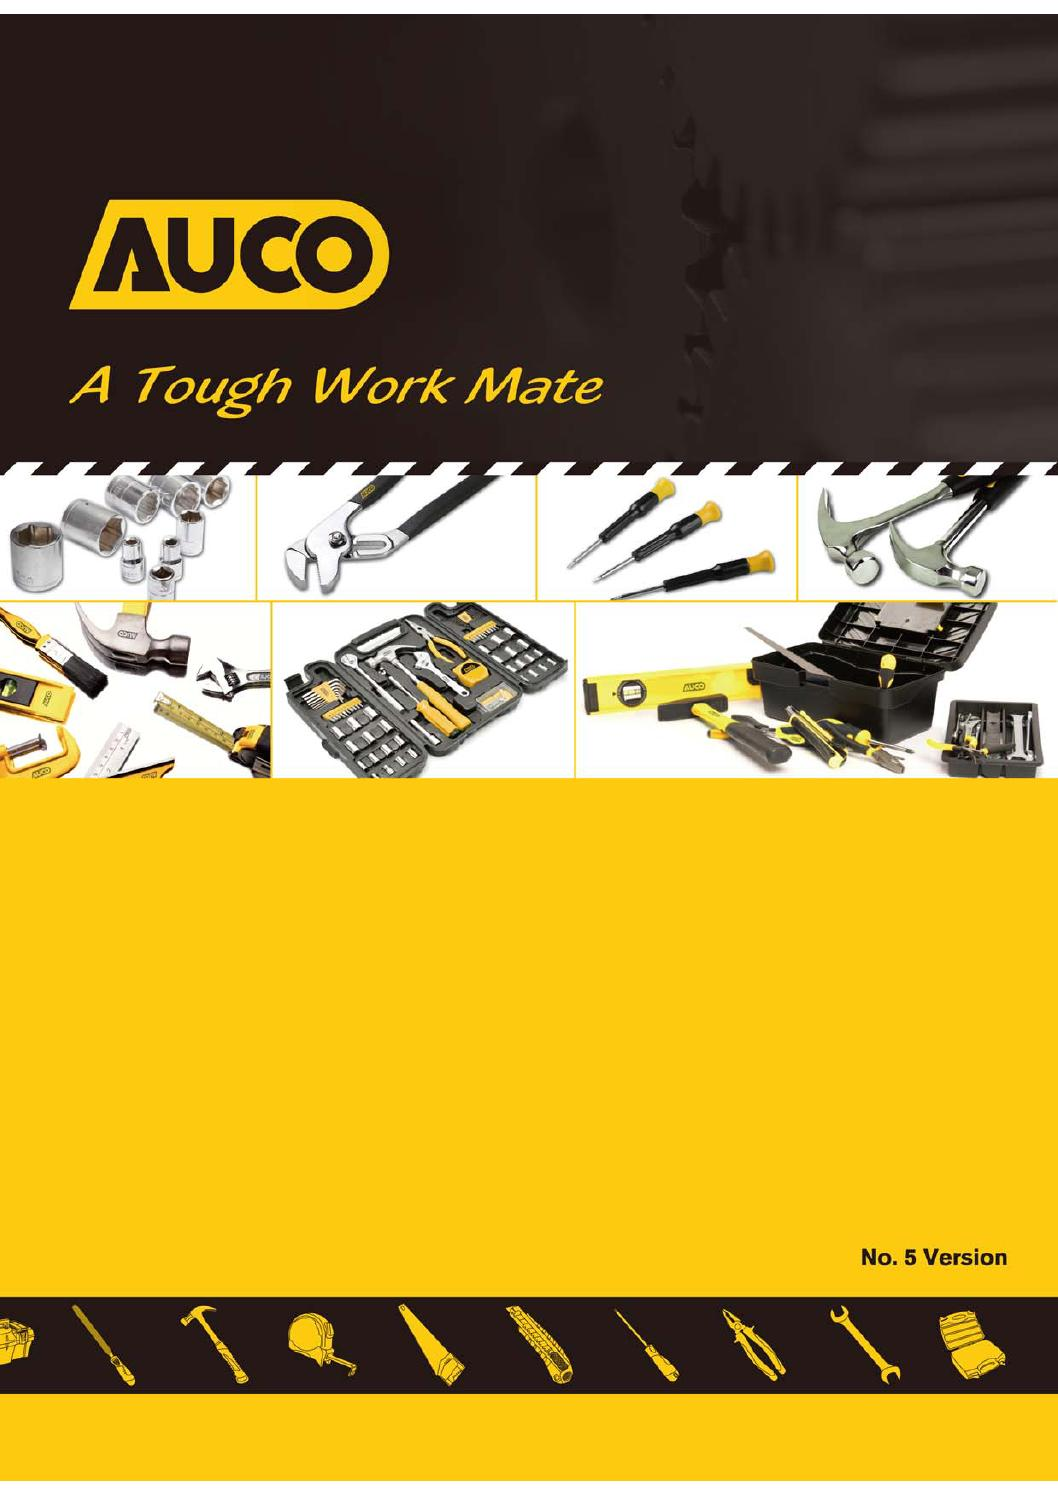 Auco diy hand tool catalogue by jackeyhan - Issuu